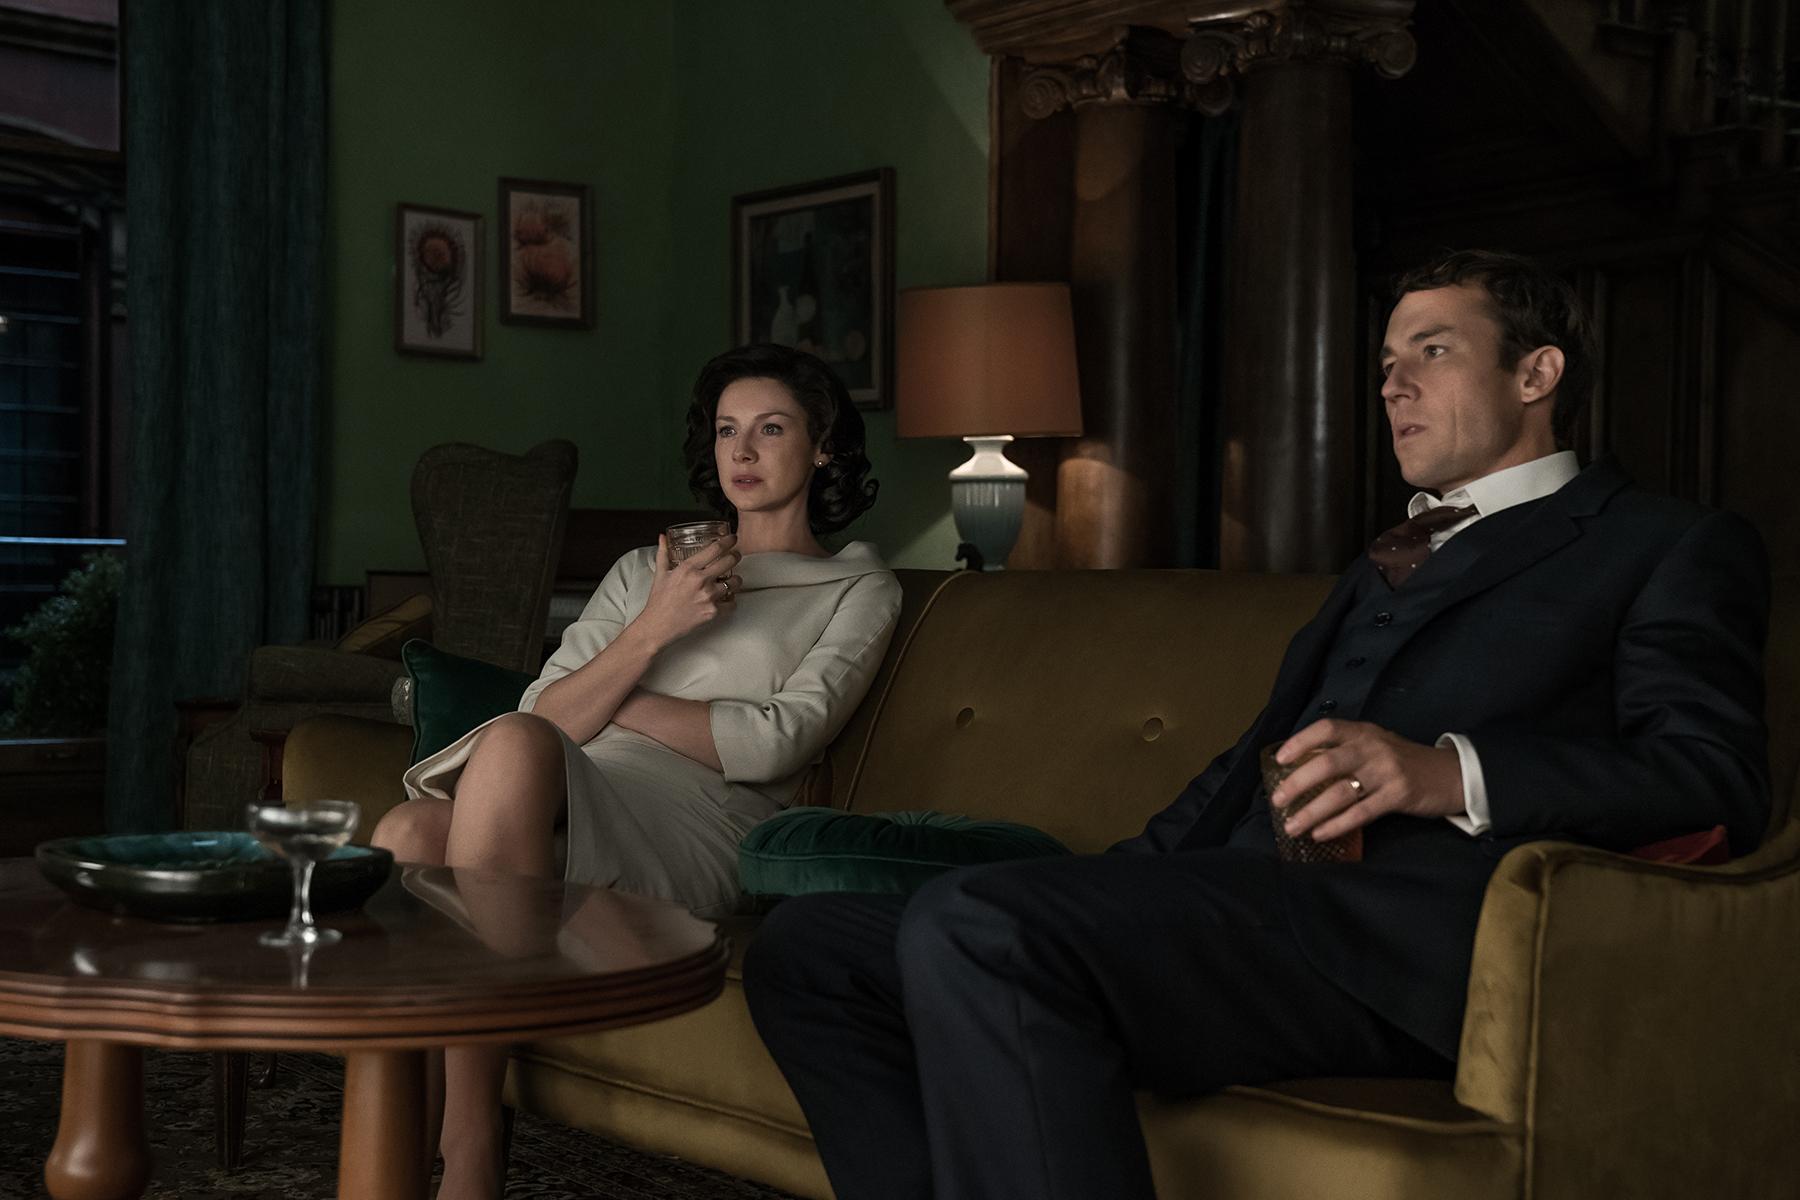 Caitriona Balfe (Claire Randall) and Tobias Menzies (Frank Randall)